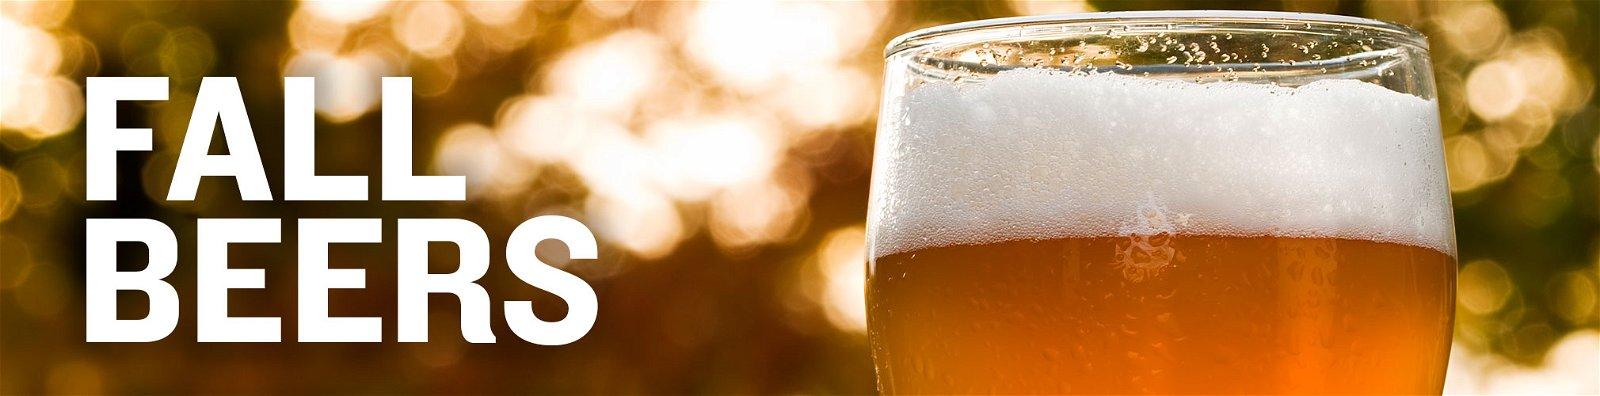 Fall Beer Recipe Kits